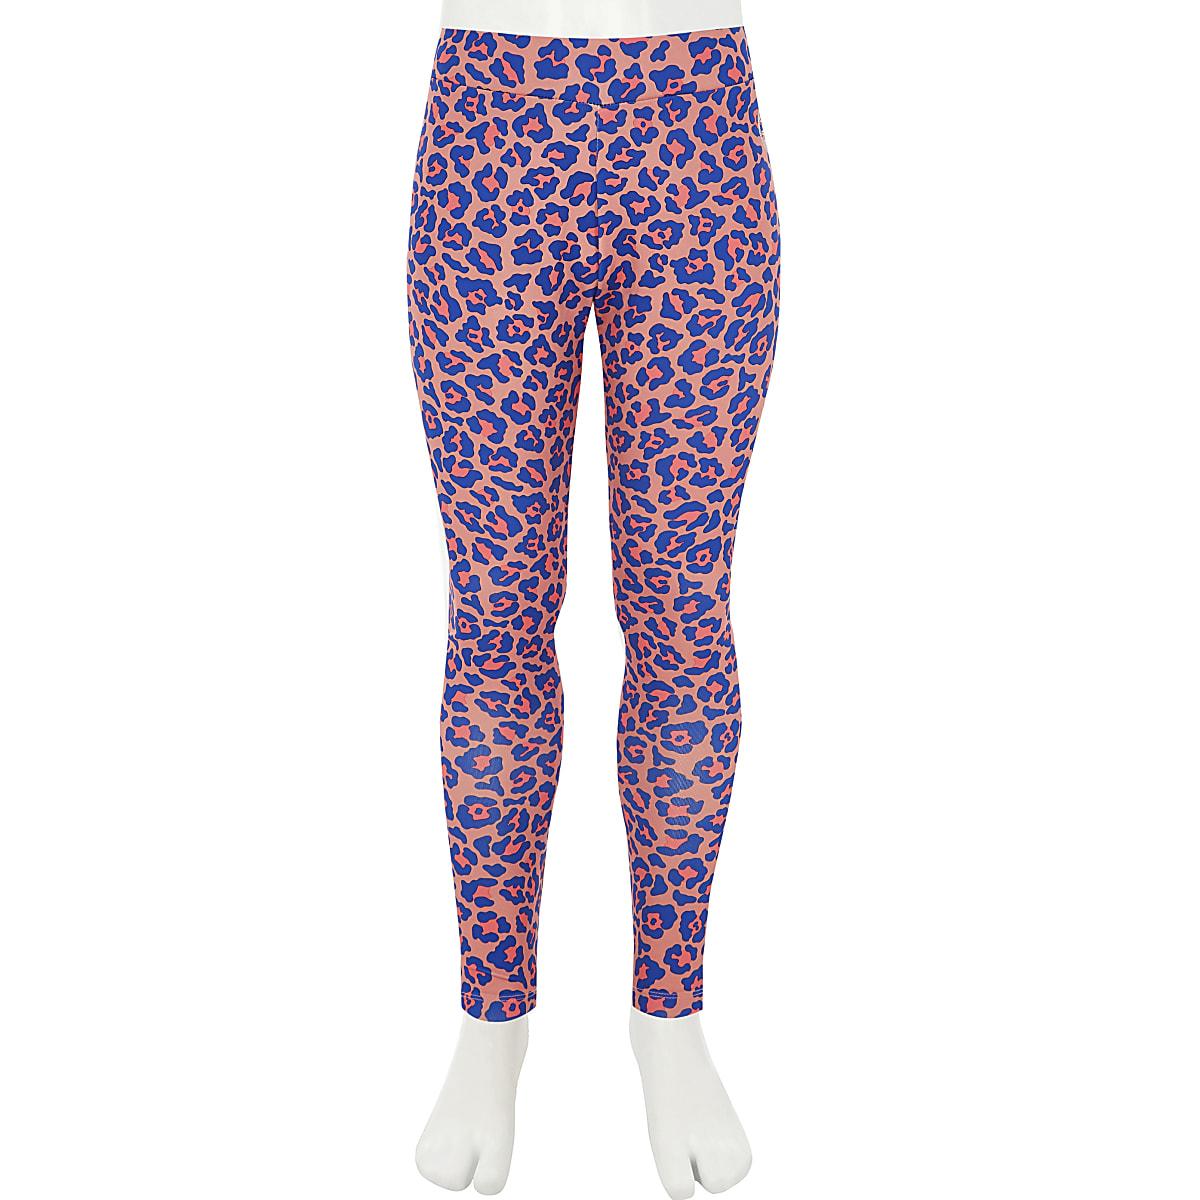 c4bc833167d88 Girls Converse pink leopard print leggings - Leggings - girls